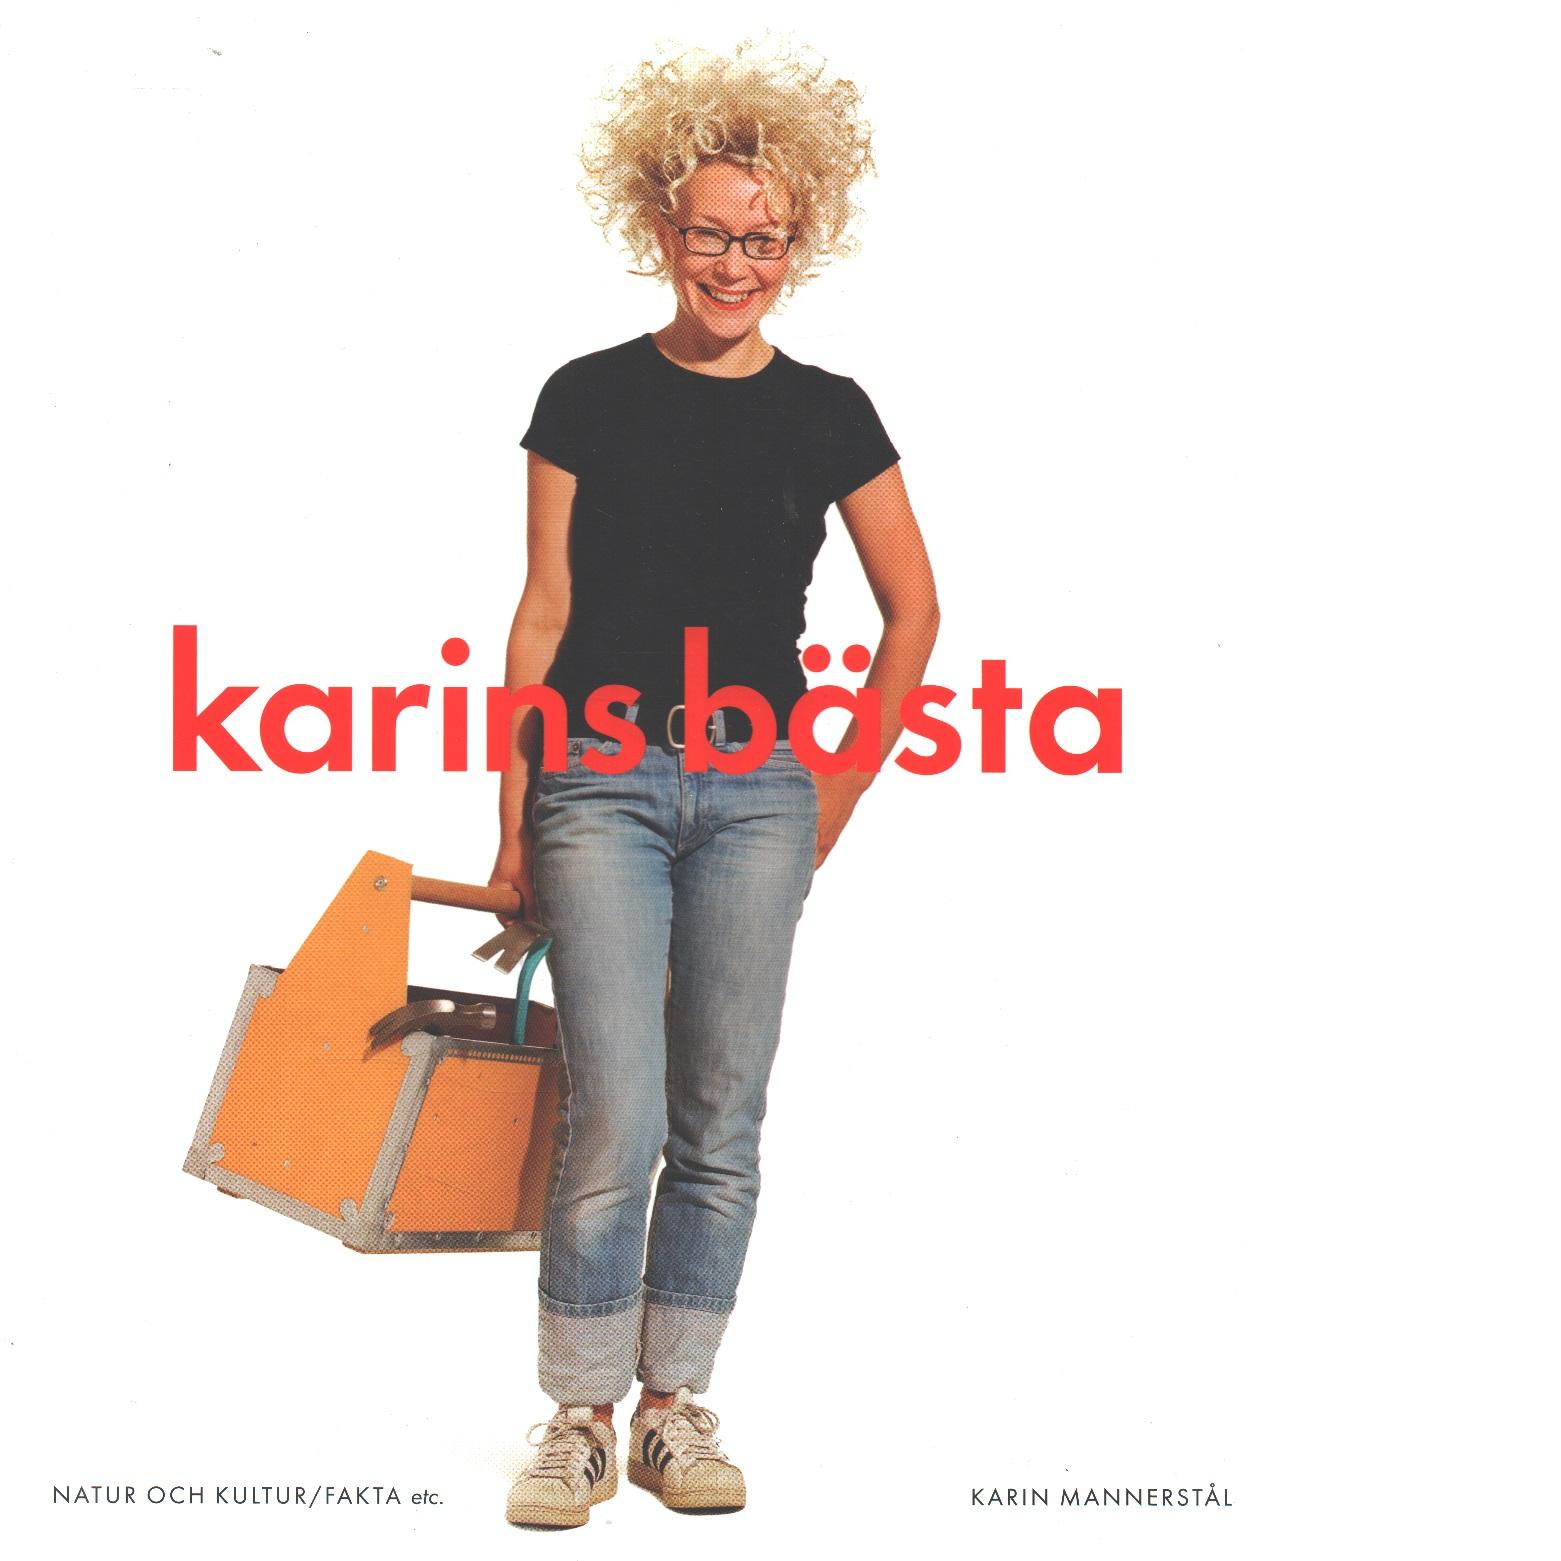 Karins bästa - Mannerstål, Karin